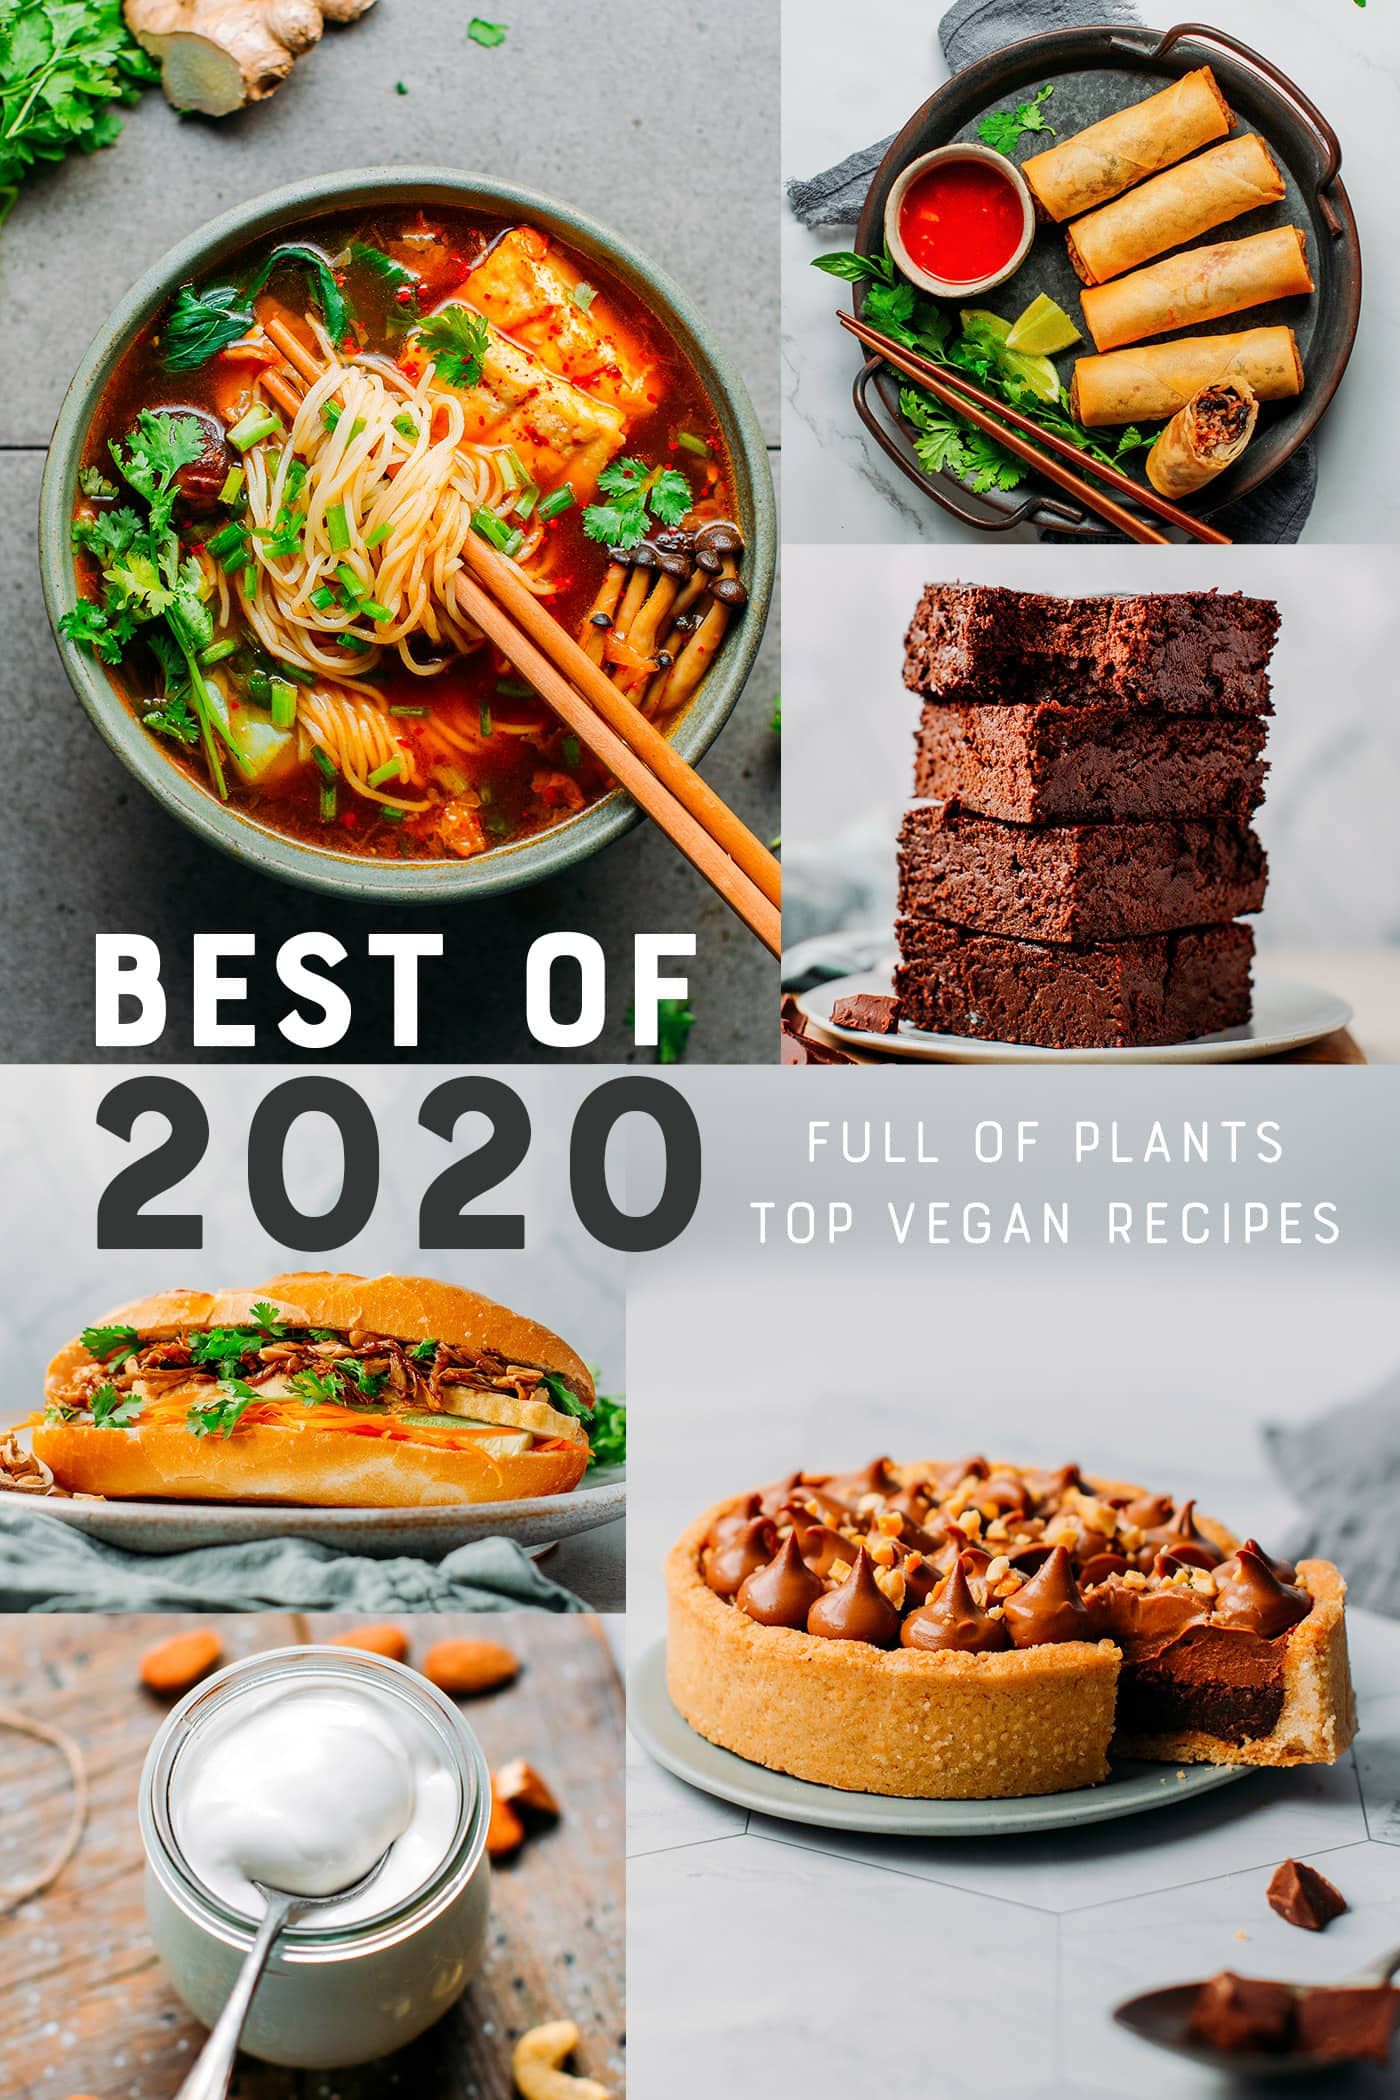 Best of 2020 - Top Vegan Recipes